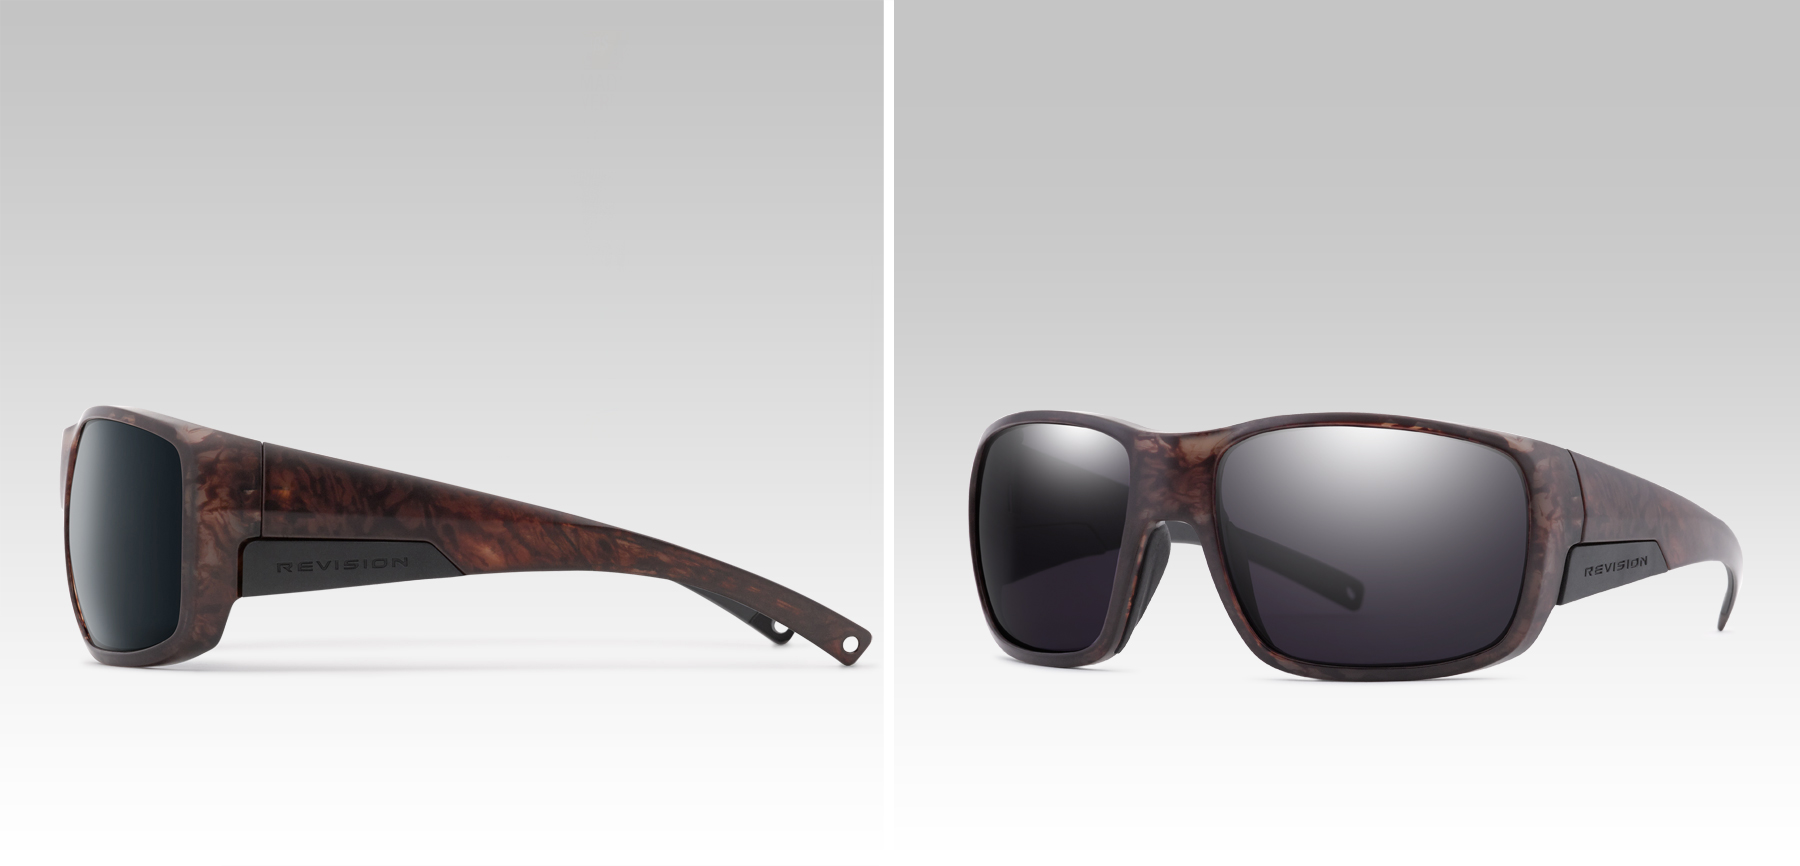 sunglasses-layout.jpg